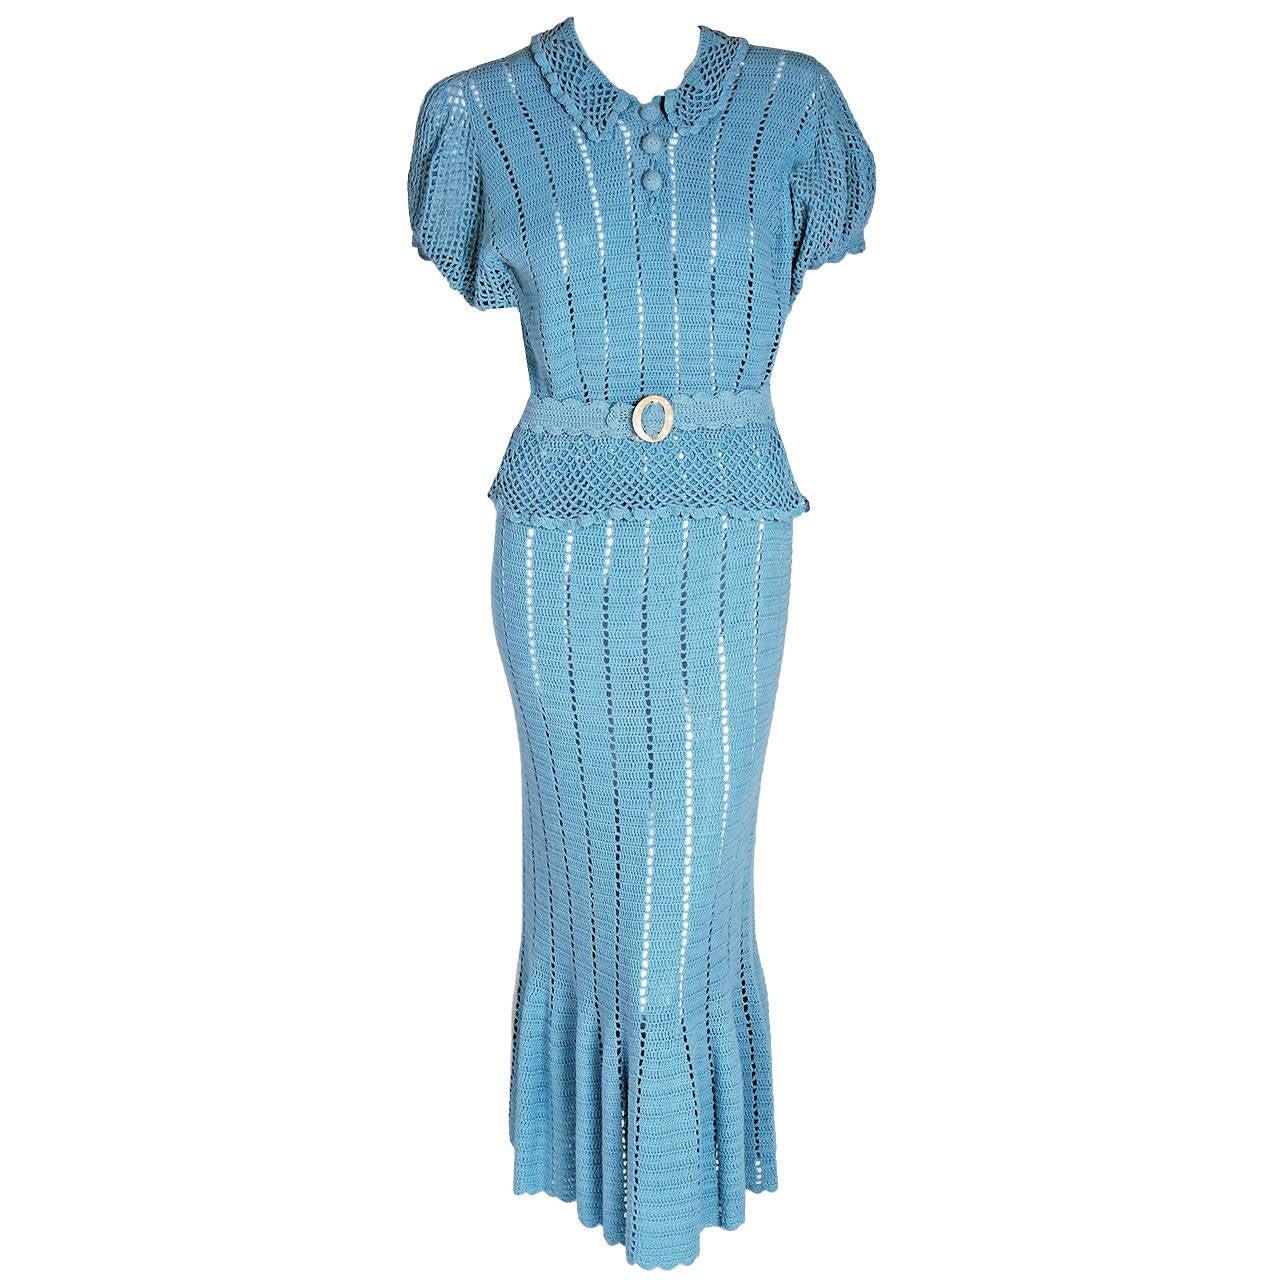 Baby blue fishtail dress